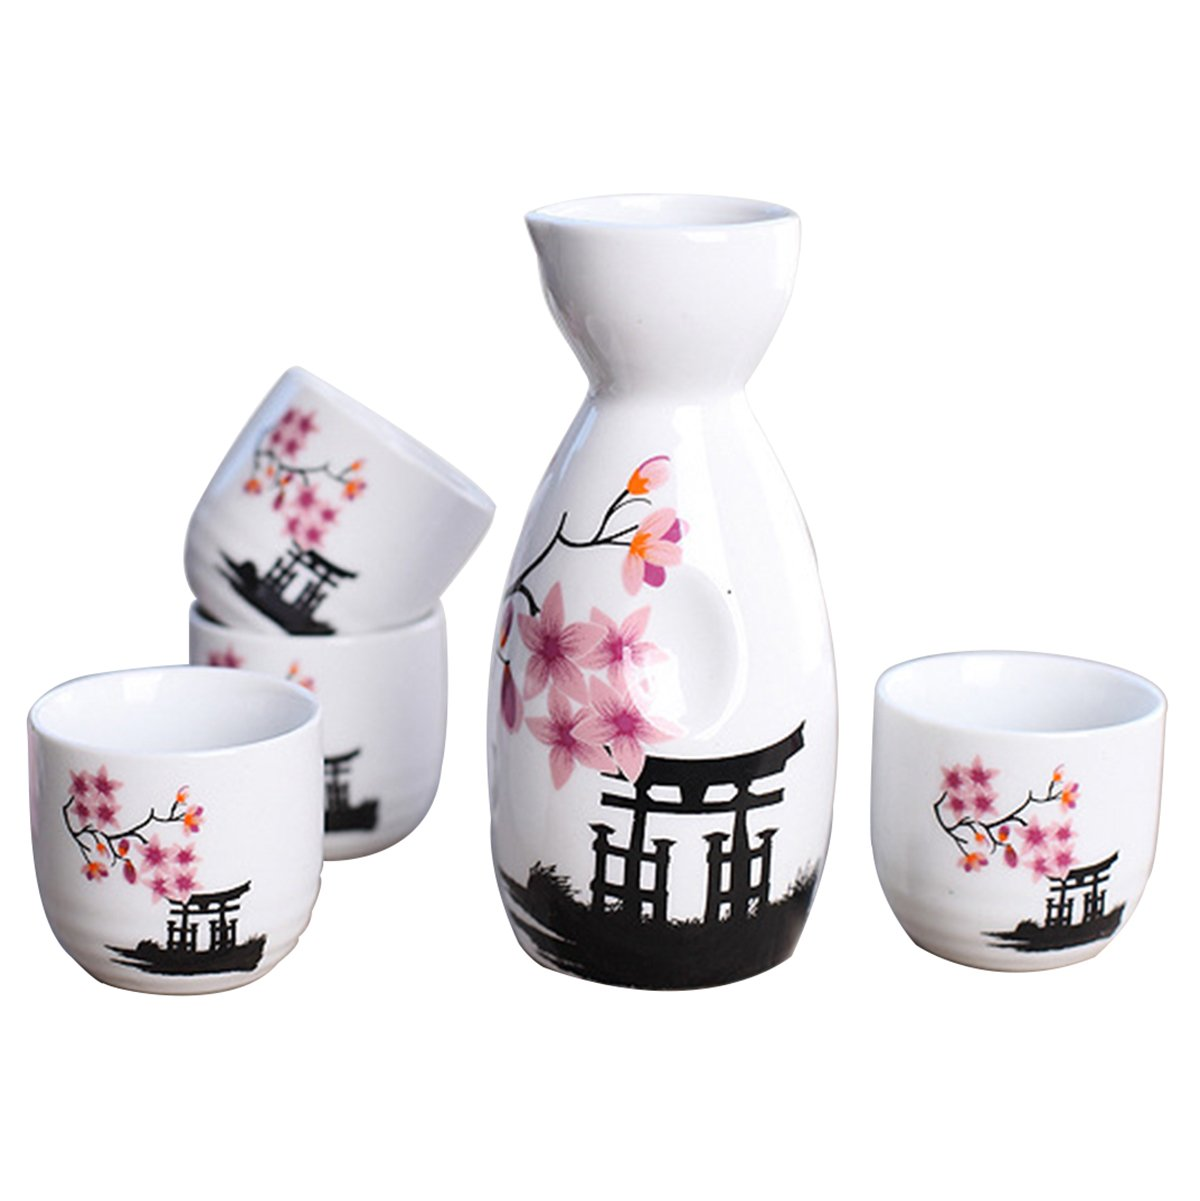 Tosnail 5 pcs Ceramic Japanese Sake Set - Pink Blossom by Tosnail